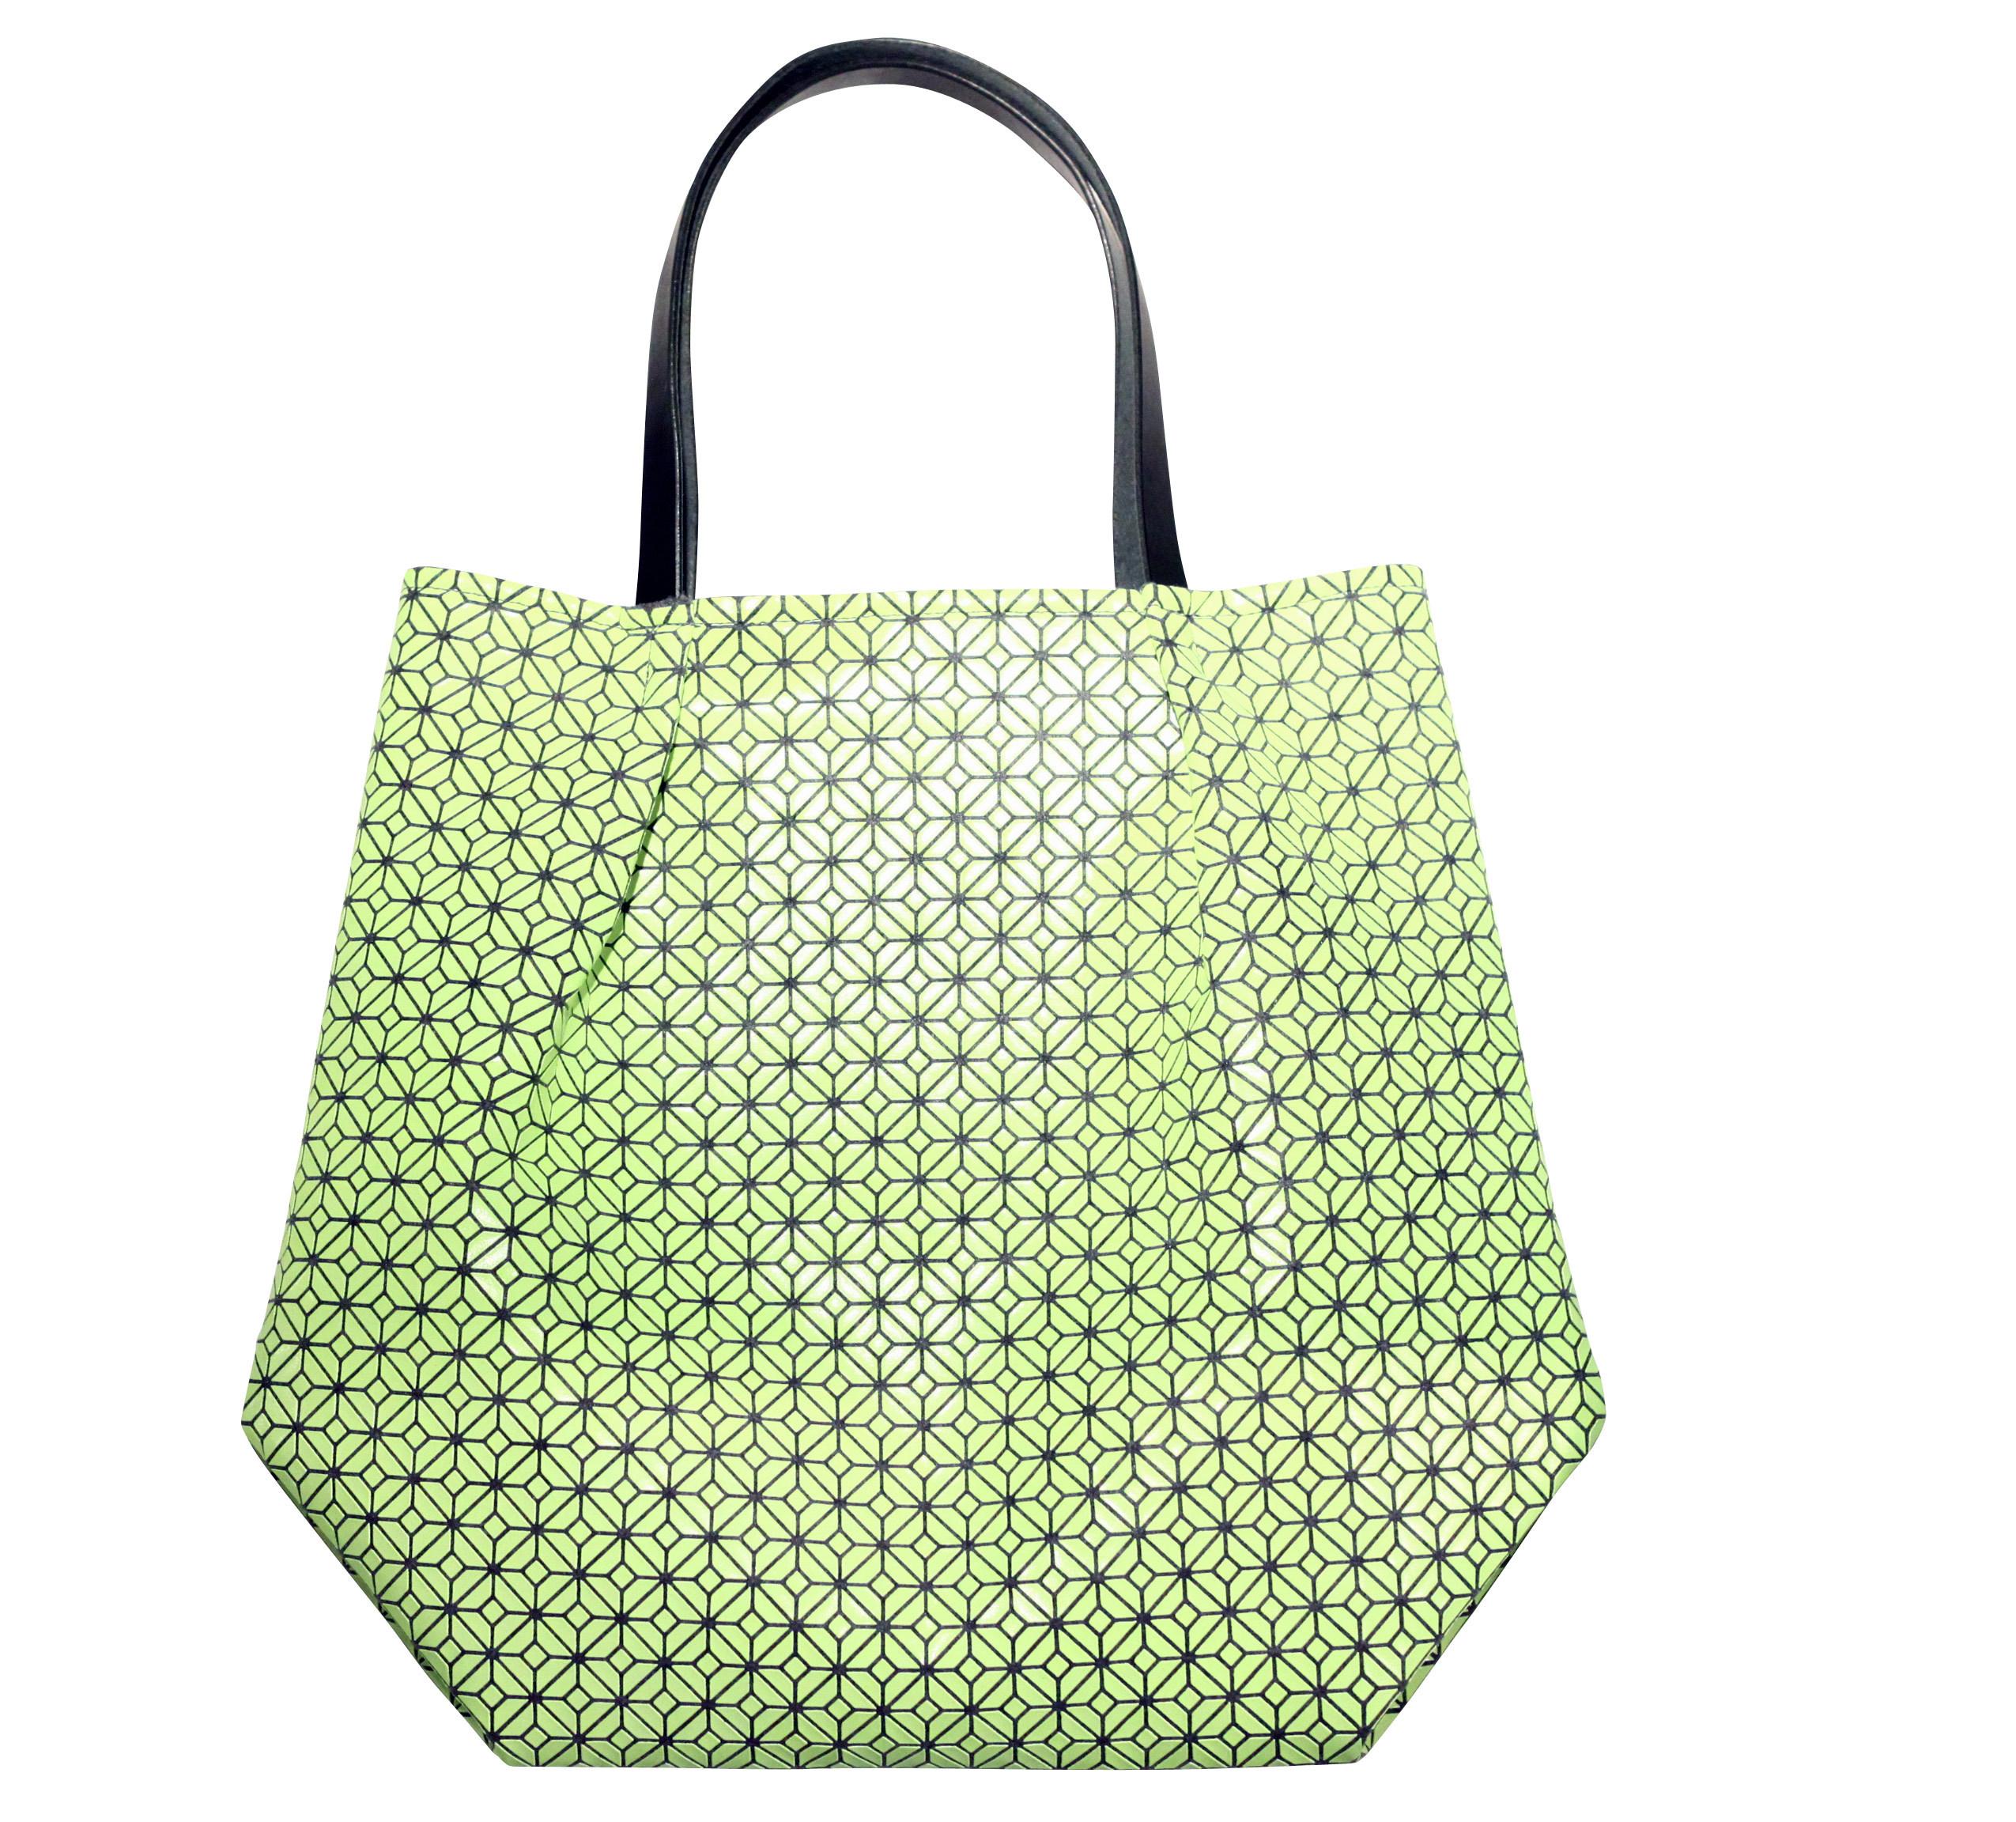 COMMON tote Bag / YELLOW